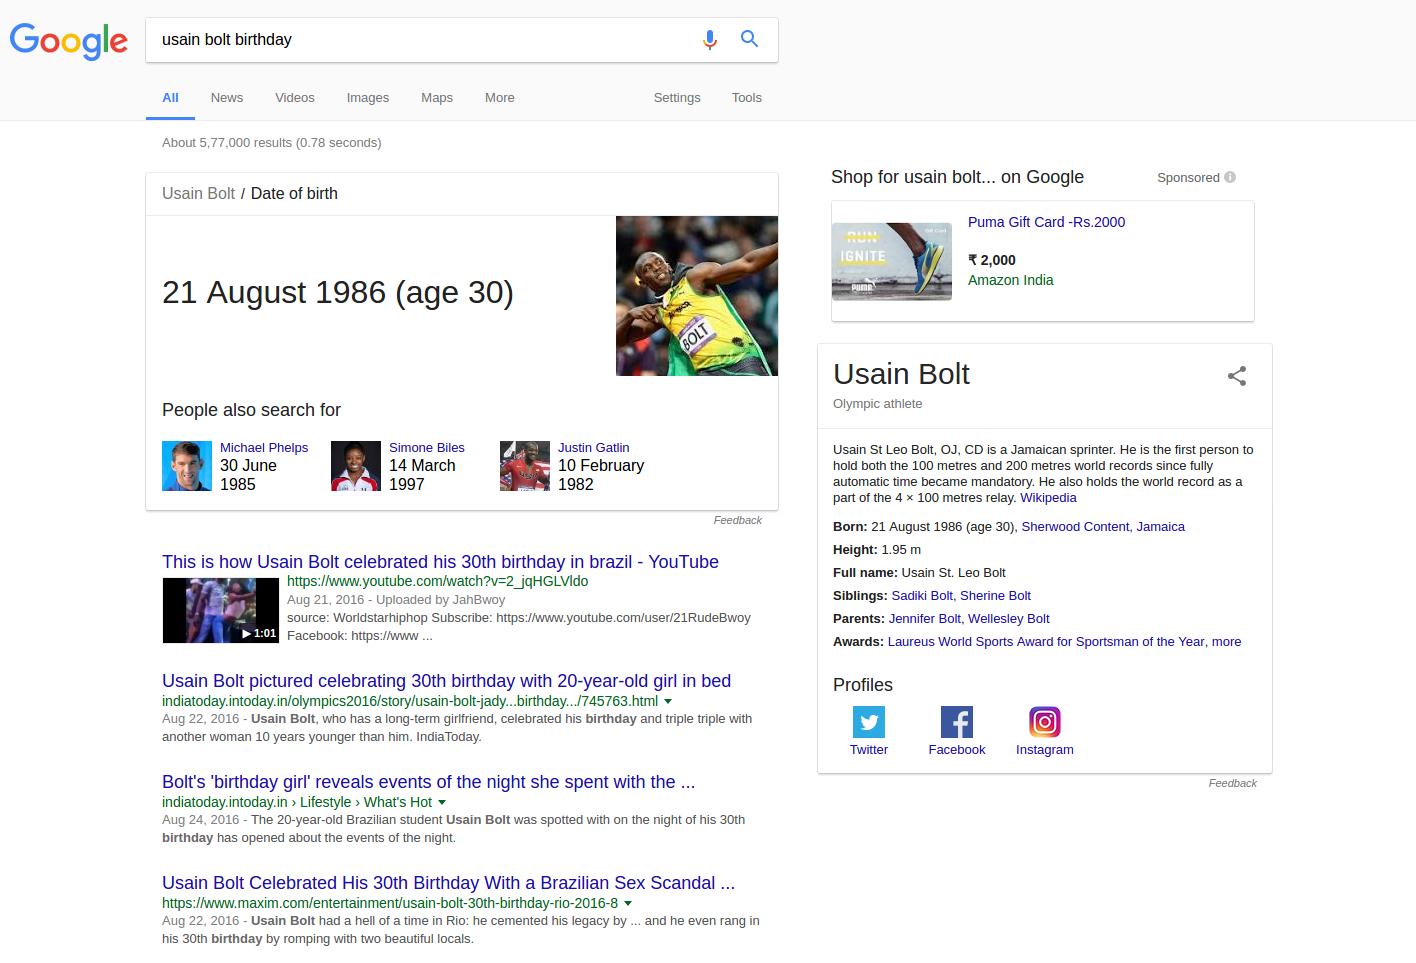 Semantic based Search